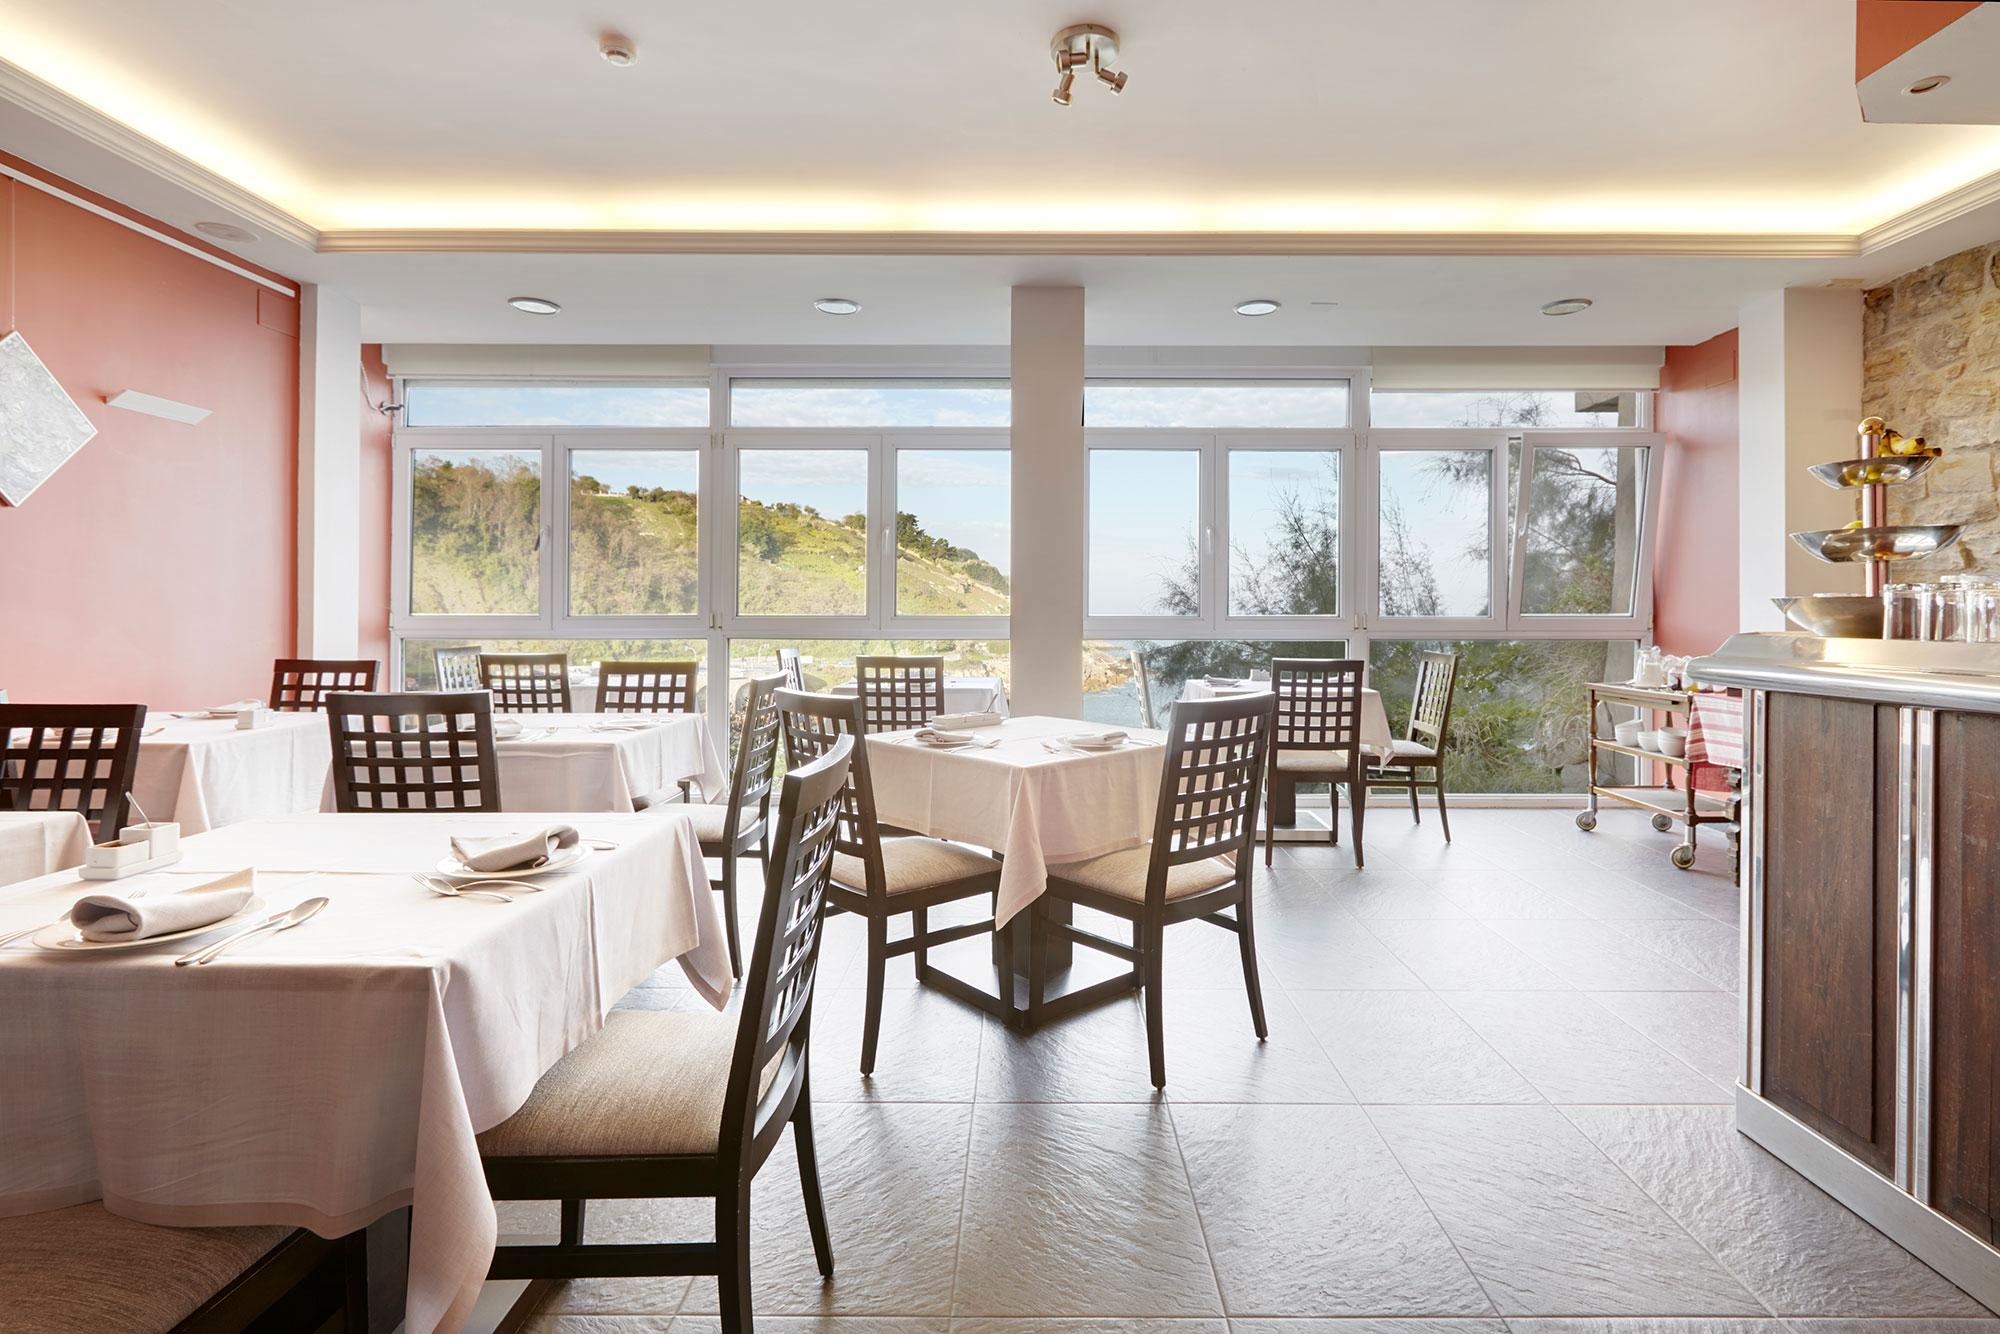 hotel-saiazgetaria-cafeteria